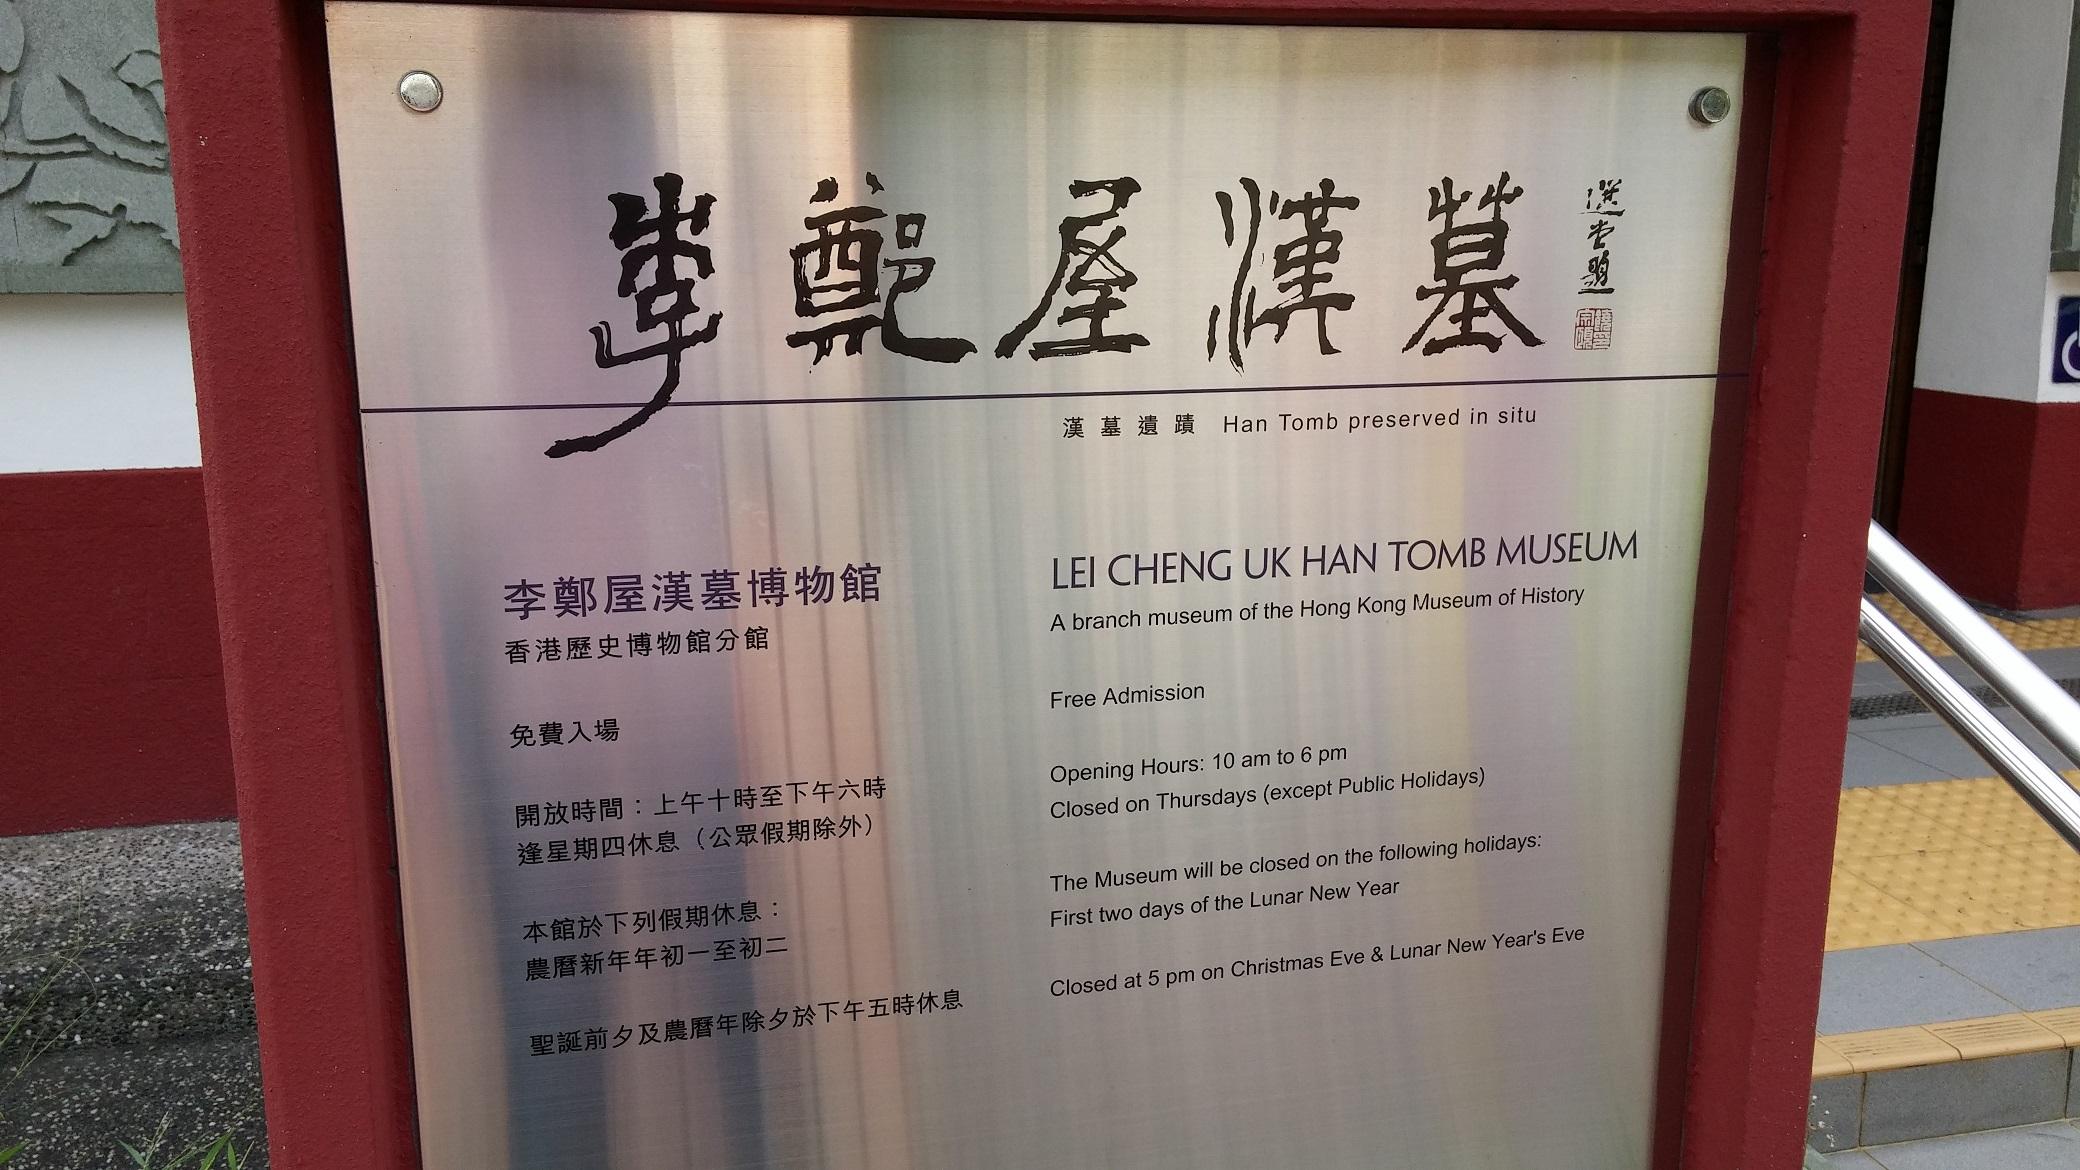 Lei Cheng Uk Han Tomb Museum